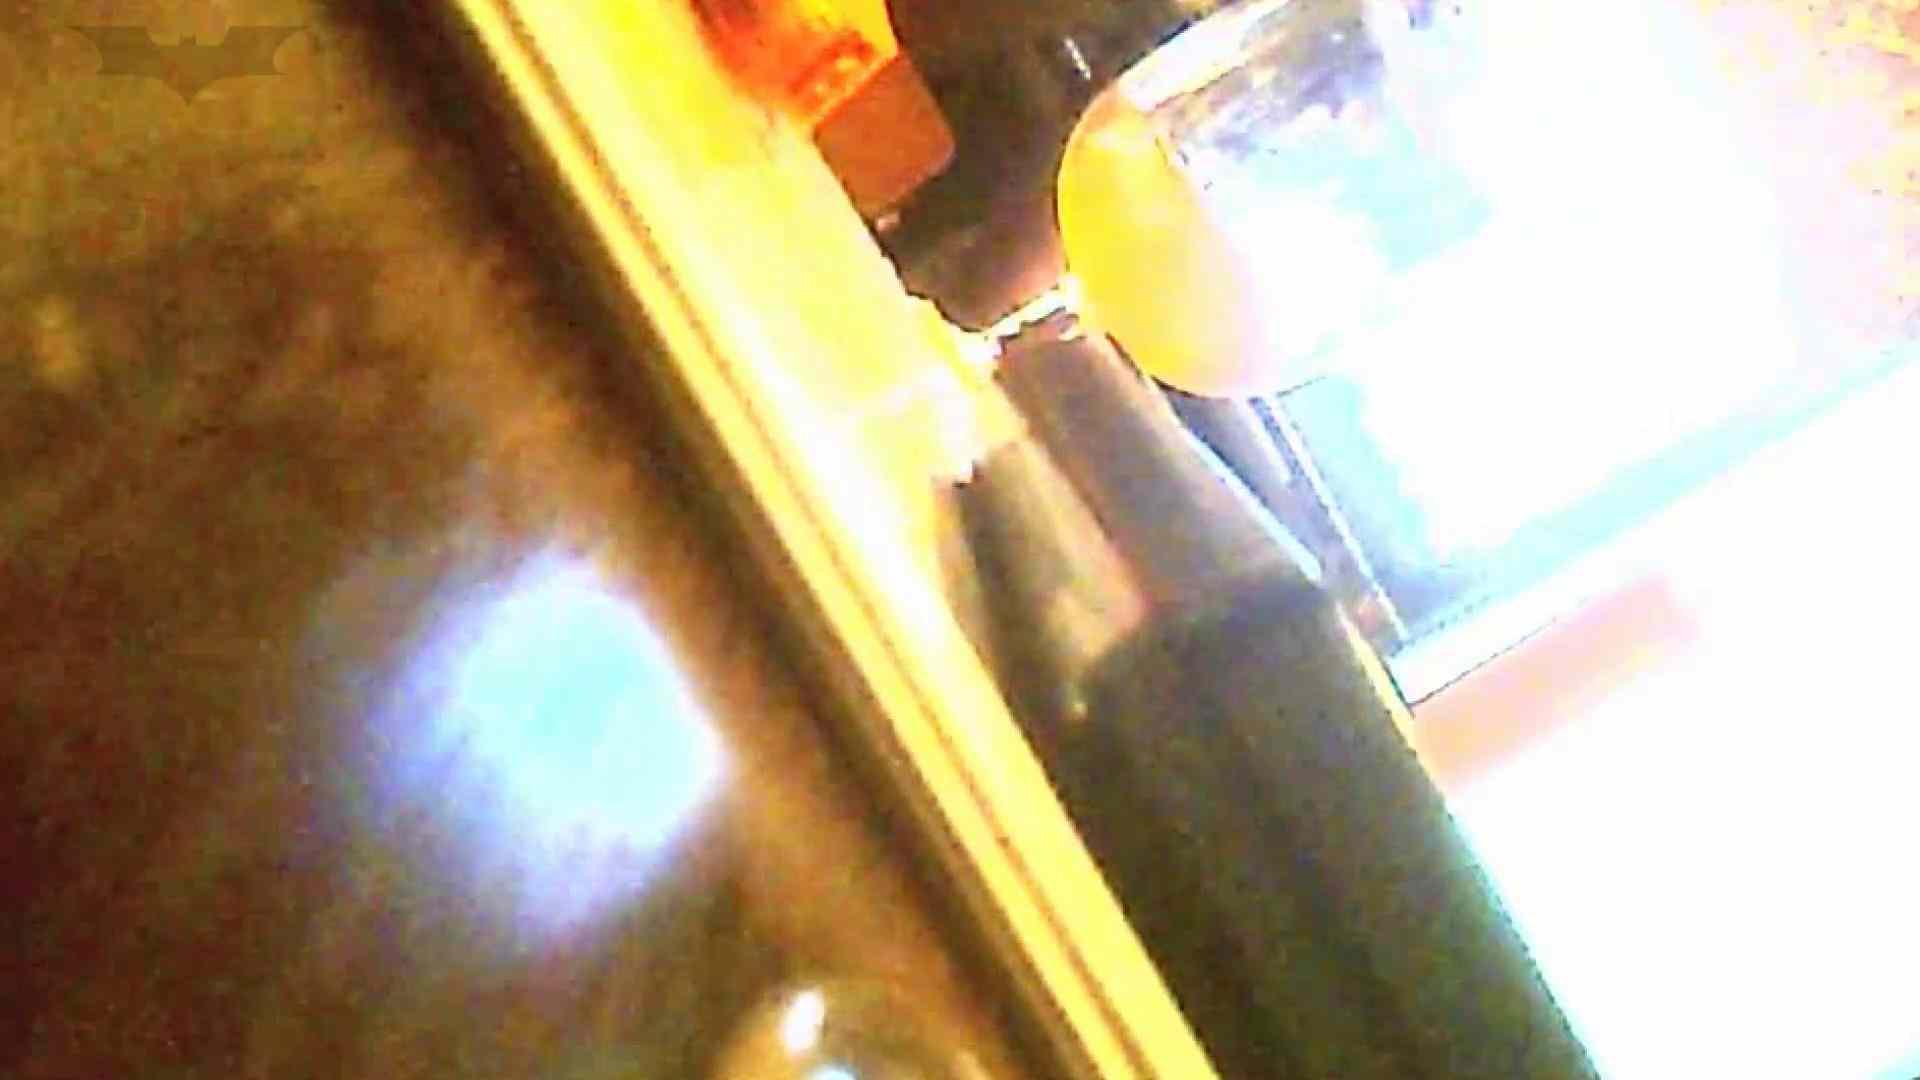 ▲2017_05位▲ 学園アイドル美人女子大生!❶4人厳選詰合せVol.49 人気作   女子大生  113画像 36